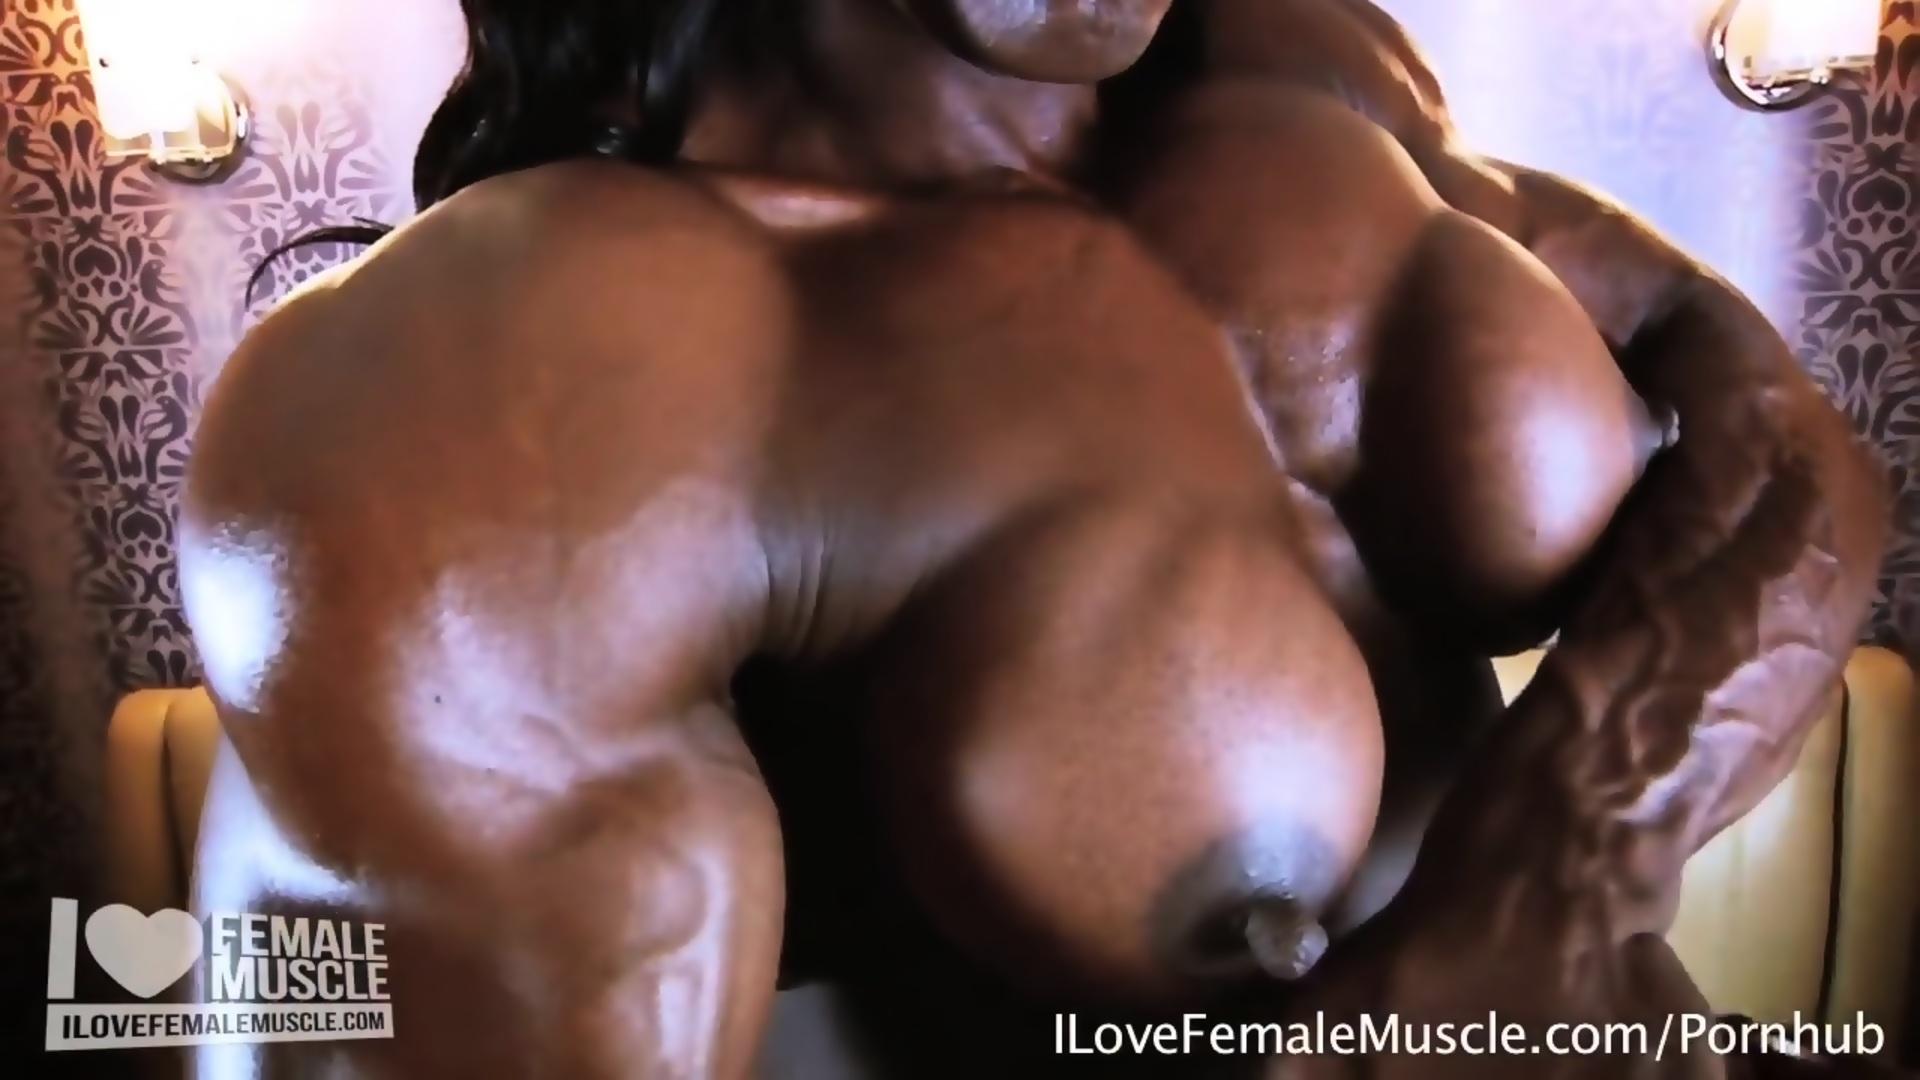 Massive muscle dominatrix mistress treasure nude flexing